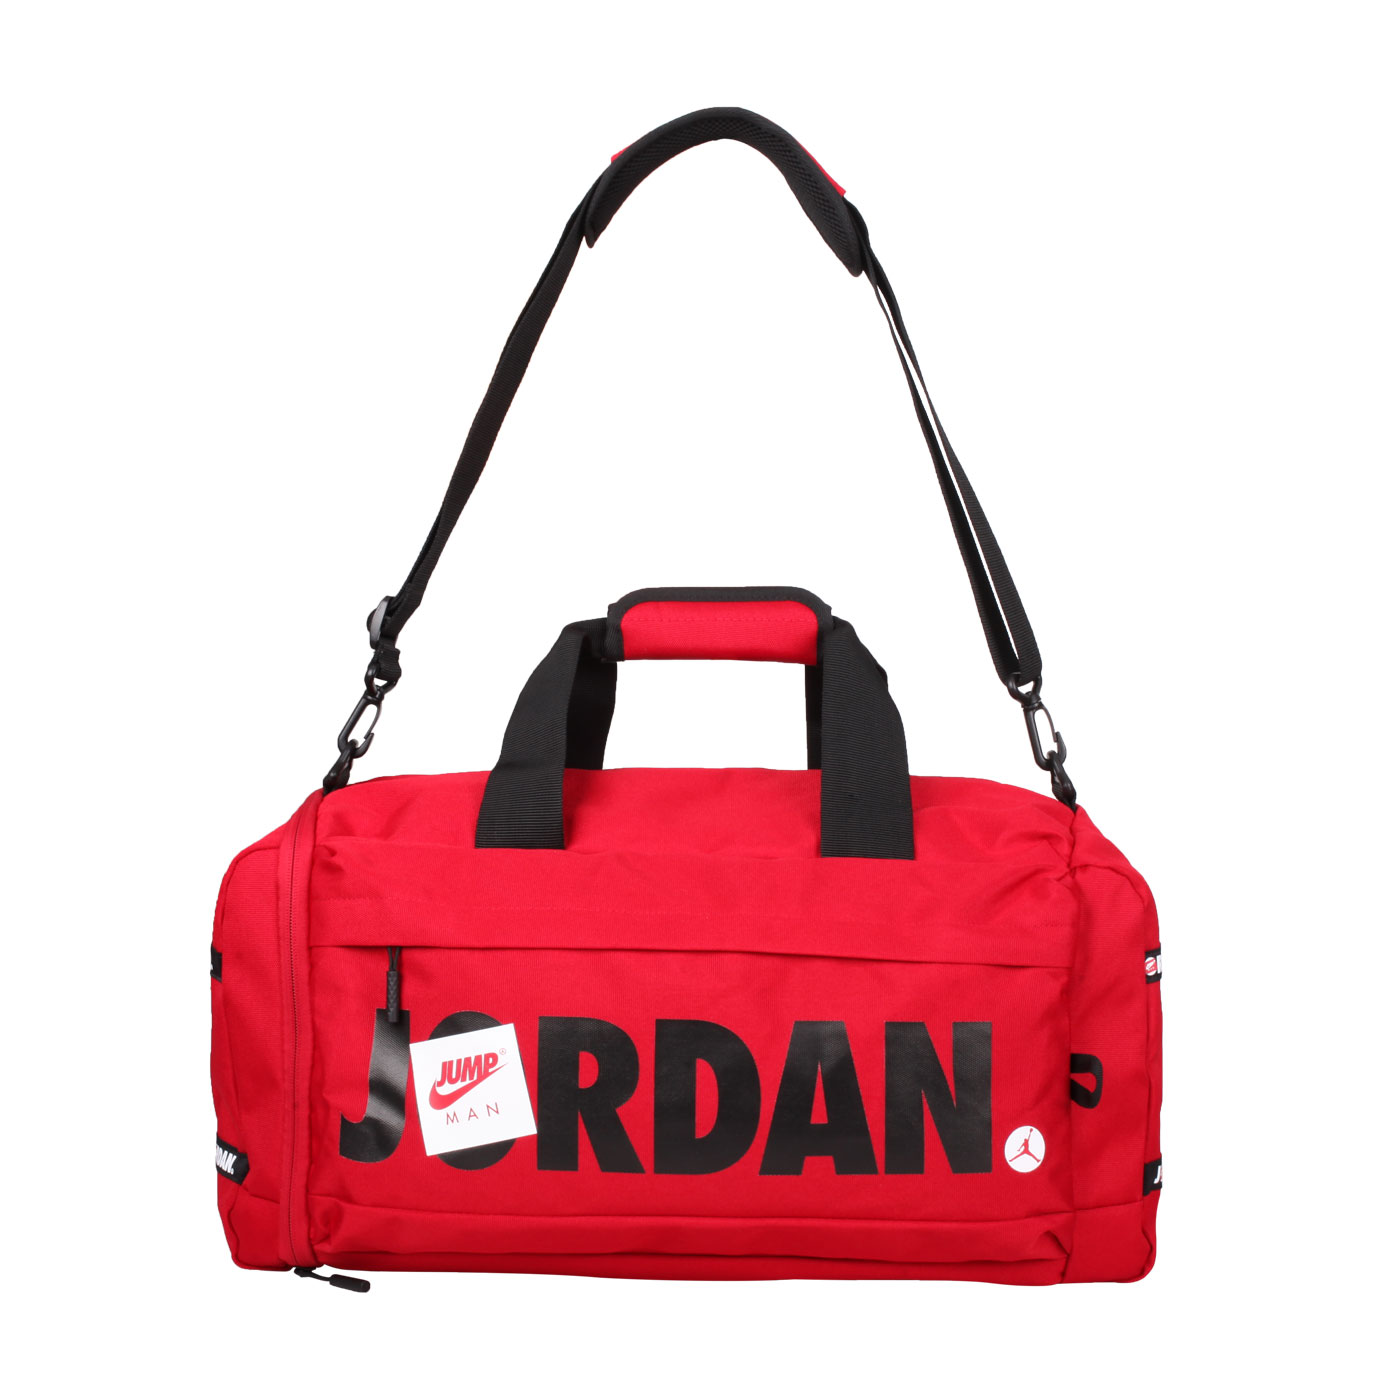 NIKE JORDAN 大型旅行袋 JD2113020AD-002 - 紅黑白